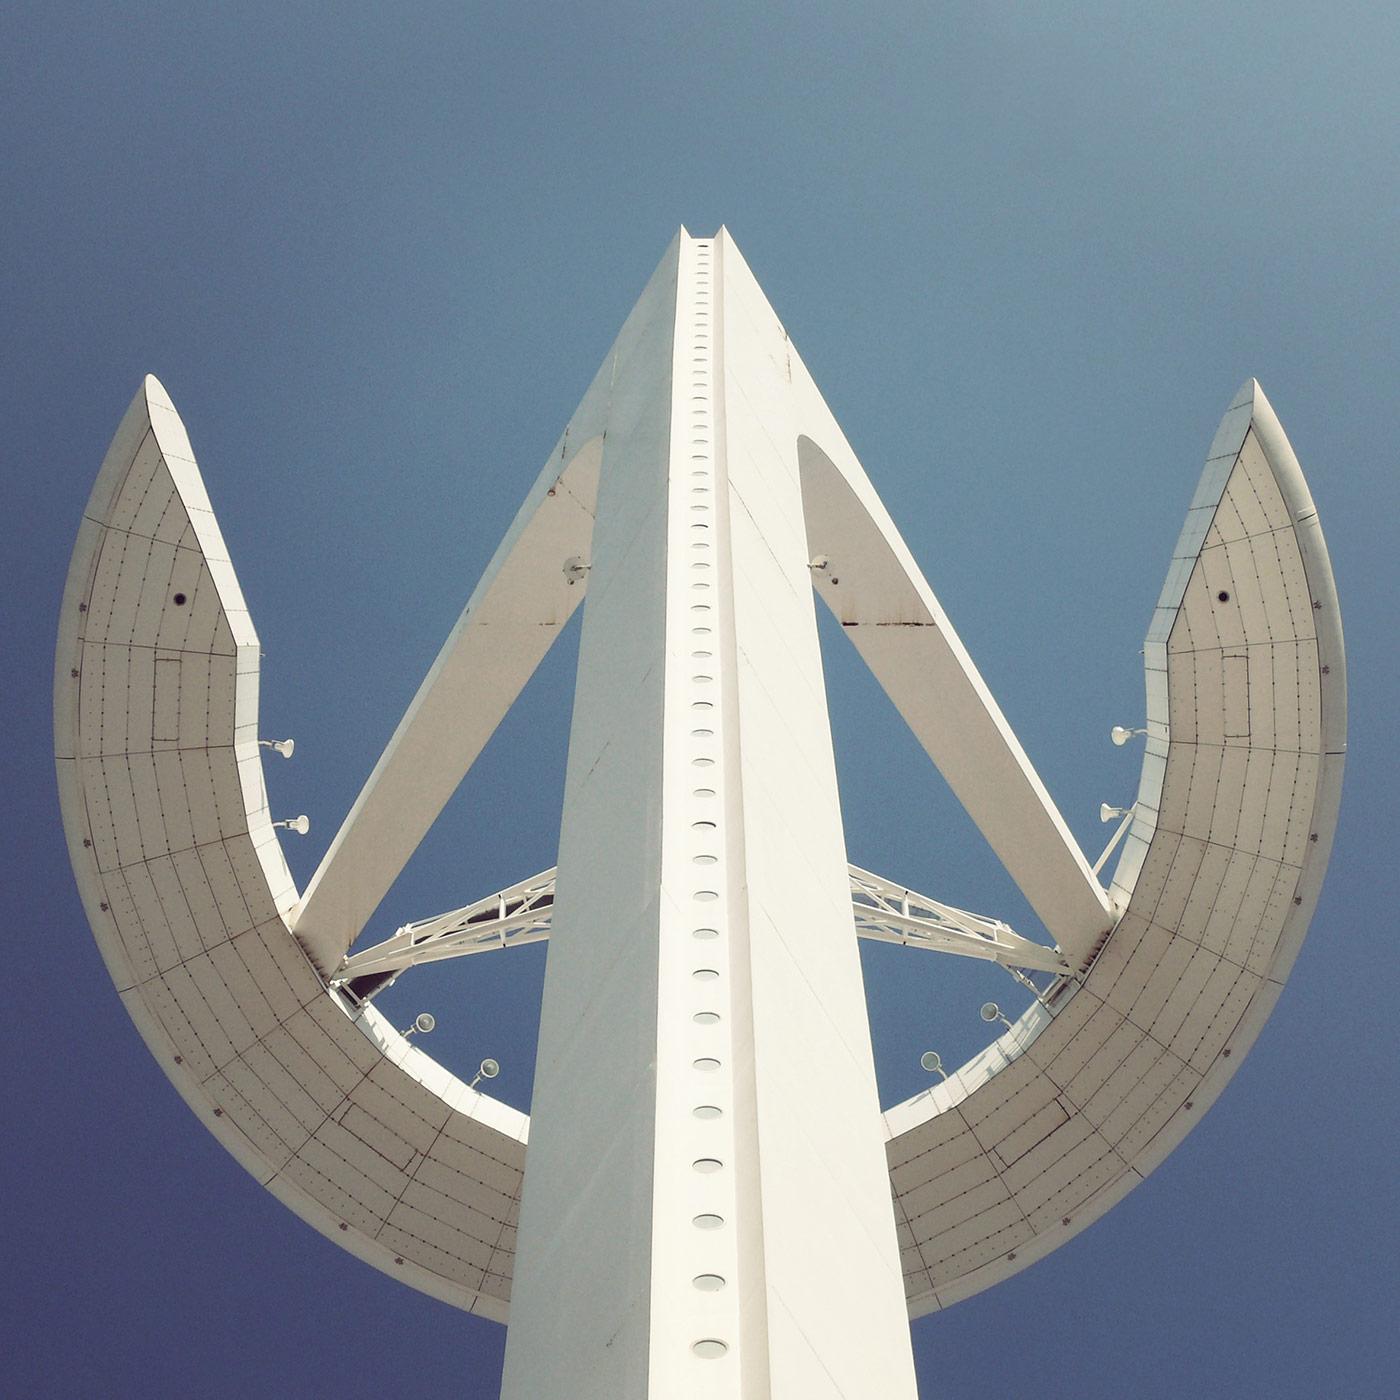 Torre de comunicacions de Montjuïc <br />Location: Barcelona, Spain <br />Architect: Santiago Calatrava